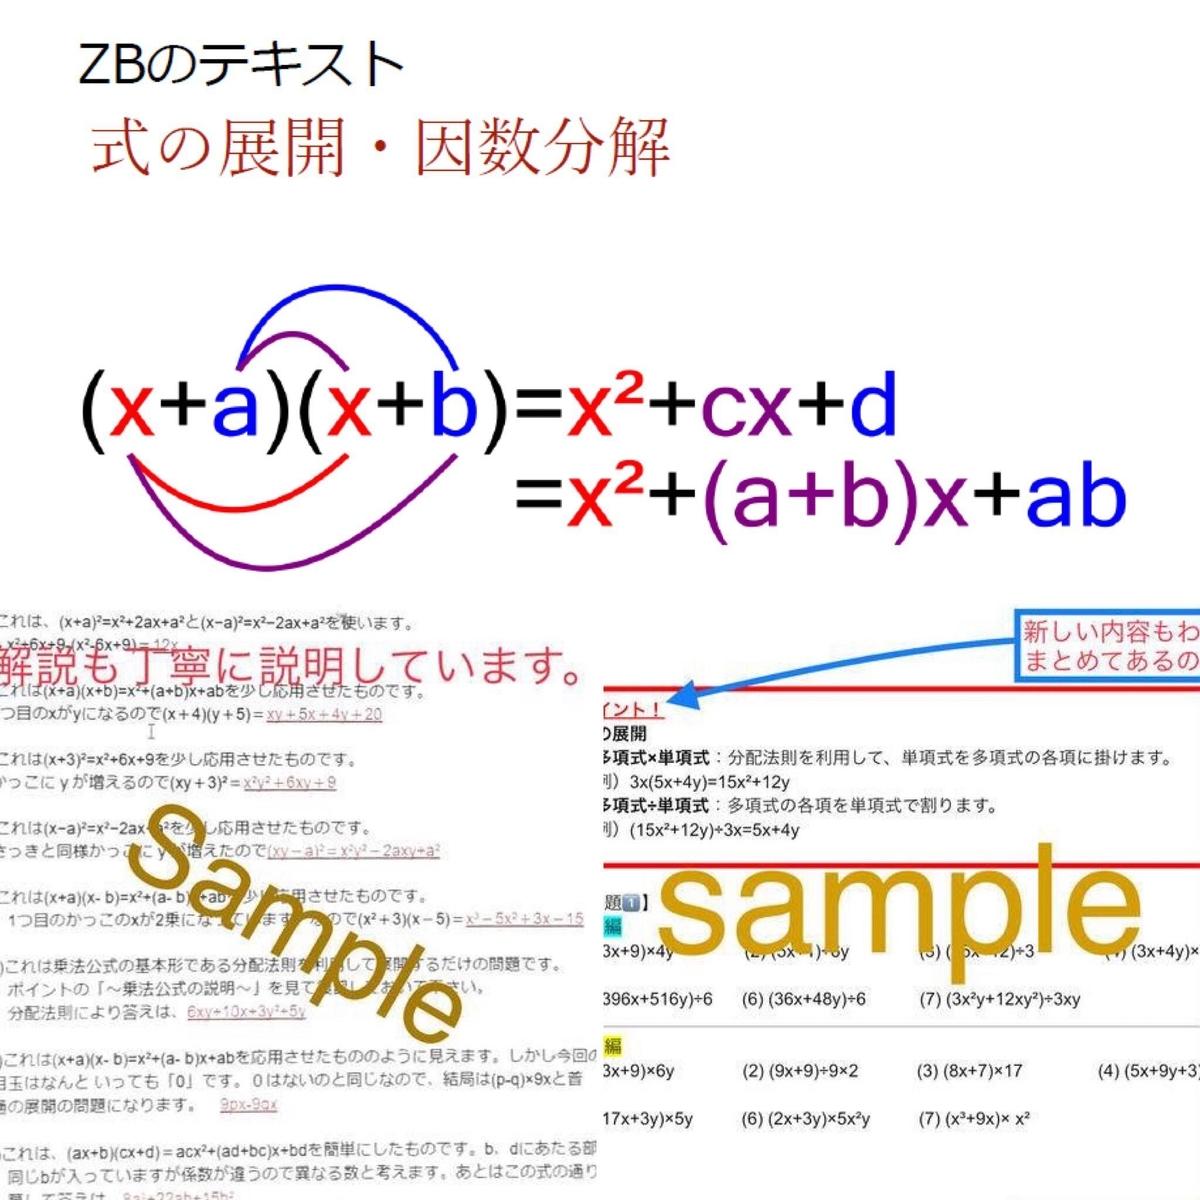 f:id:J-takeyama:20200526221915j:plain